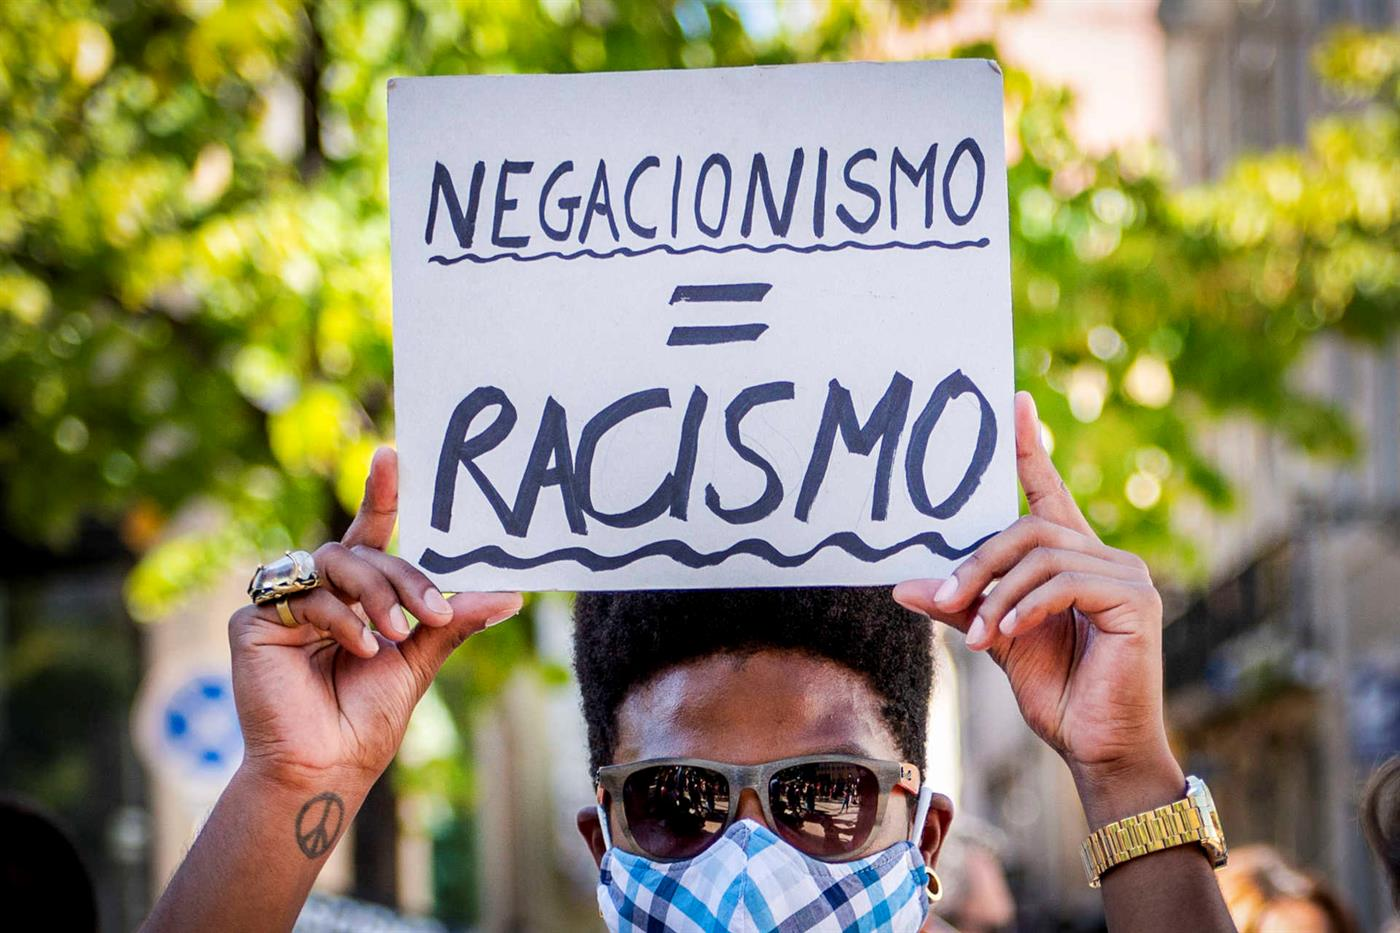 Negacionismo e racismo, tristes realidades para tempos de crise